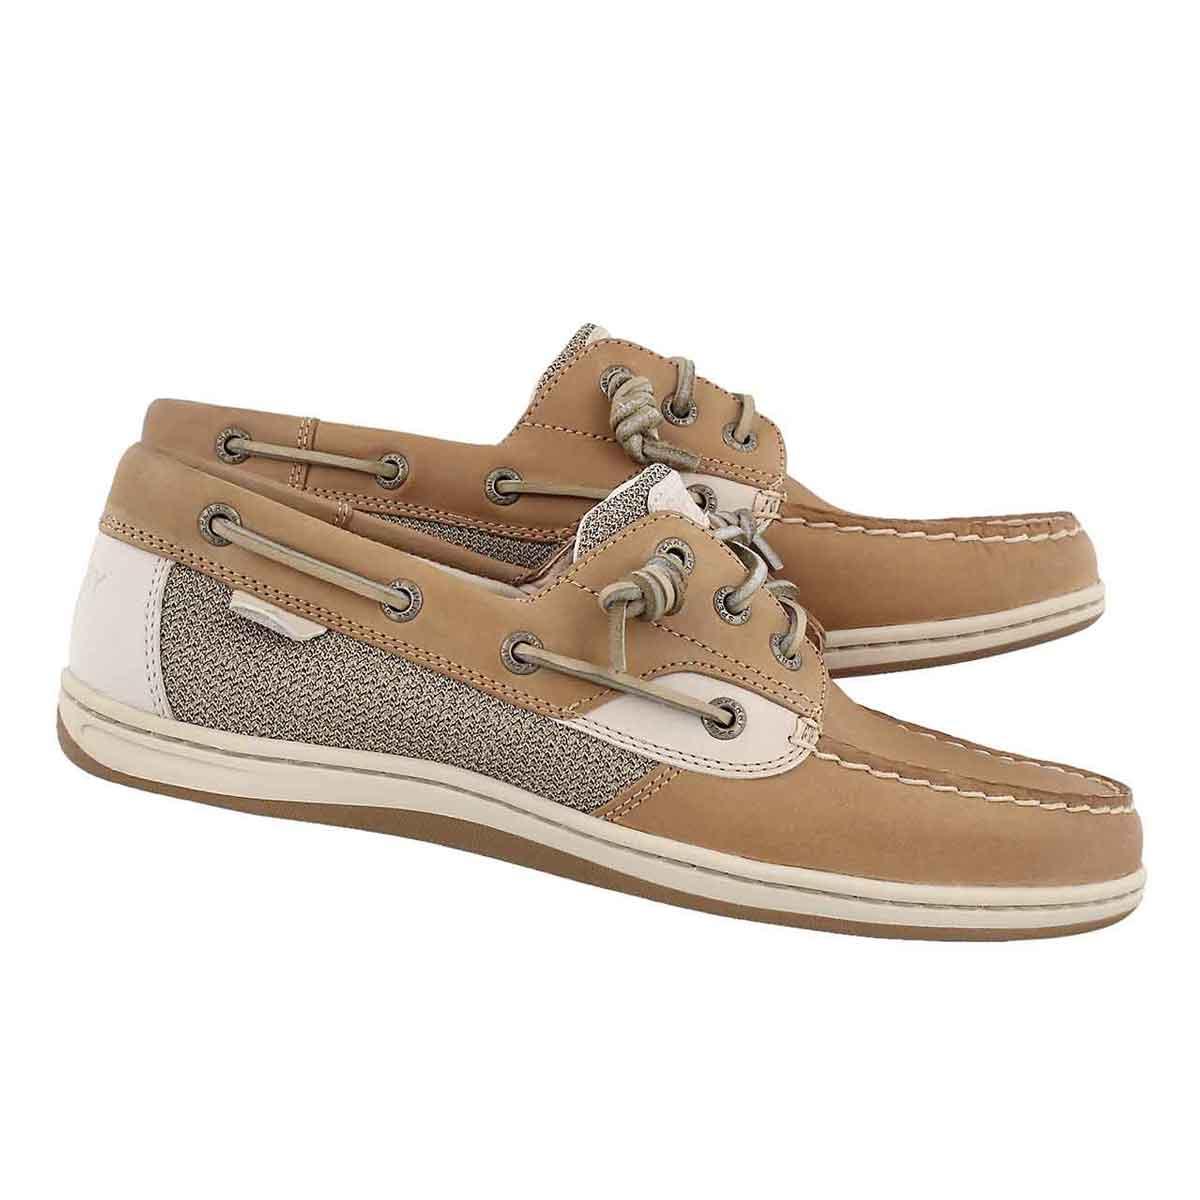 Lds Songfish linen/oat boat shoe